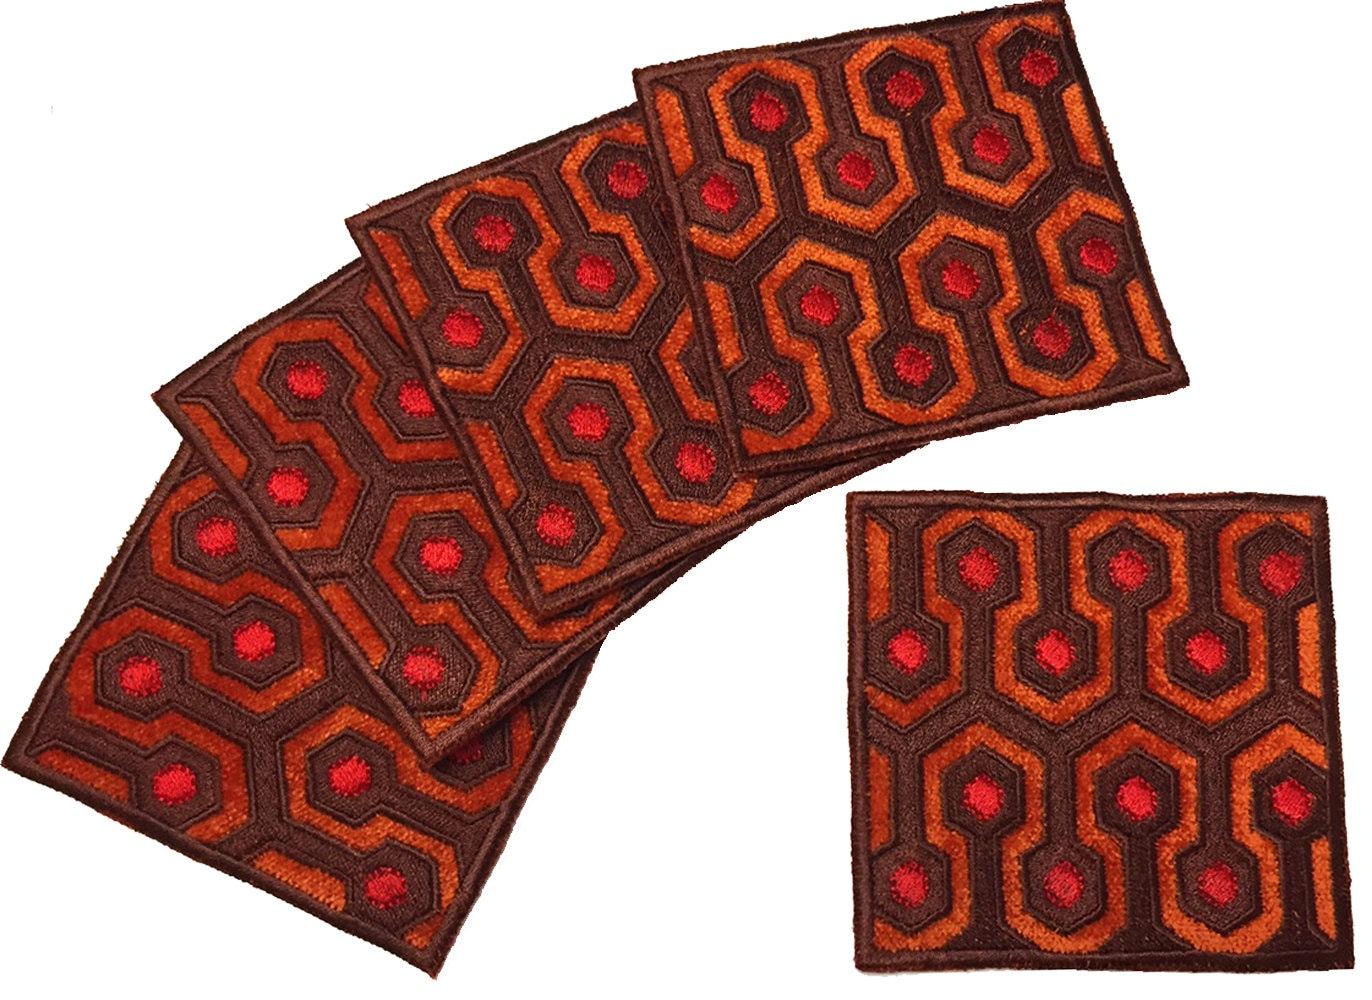 The Shining Carpet Mug Rug Coaster